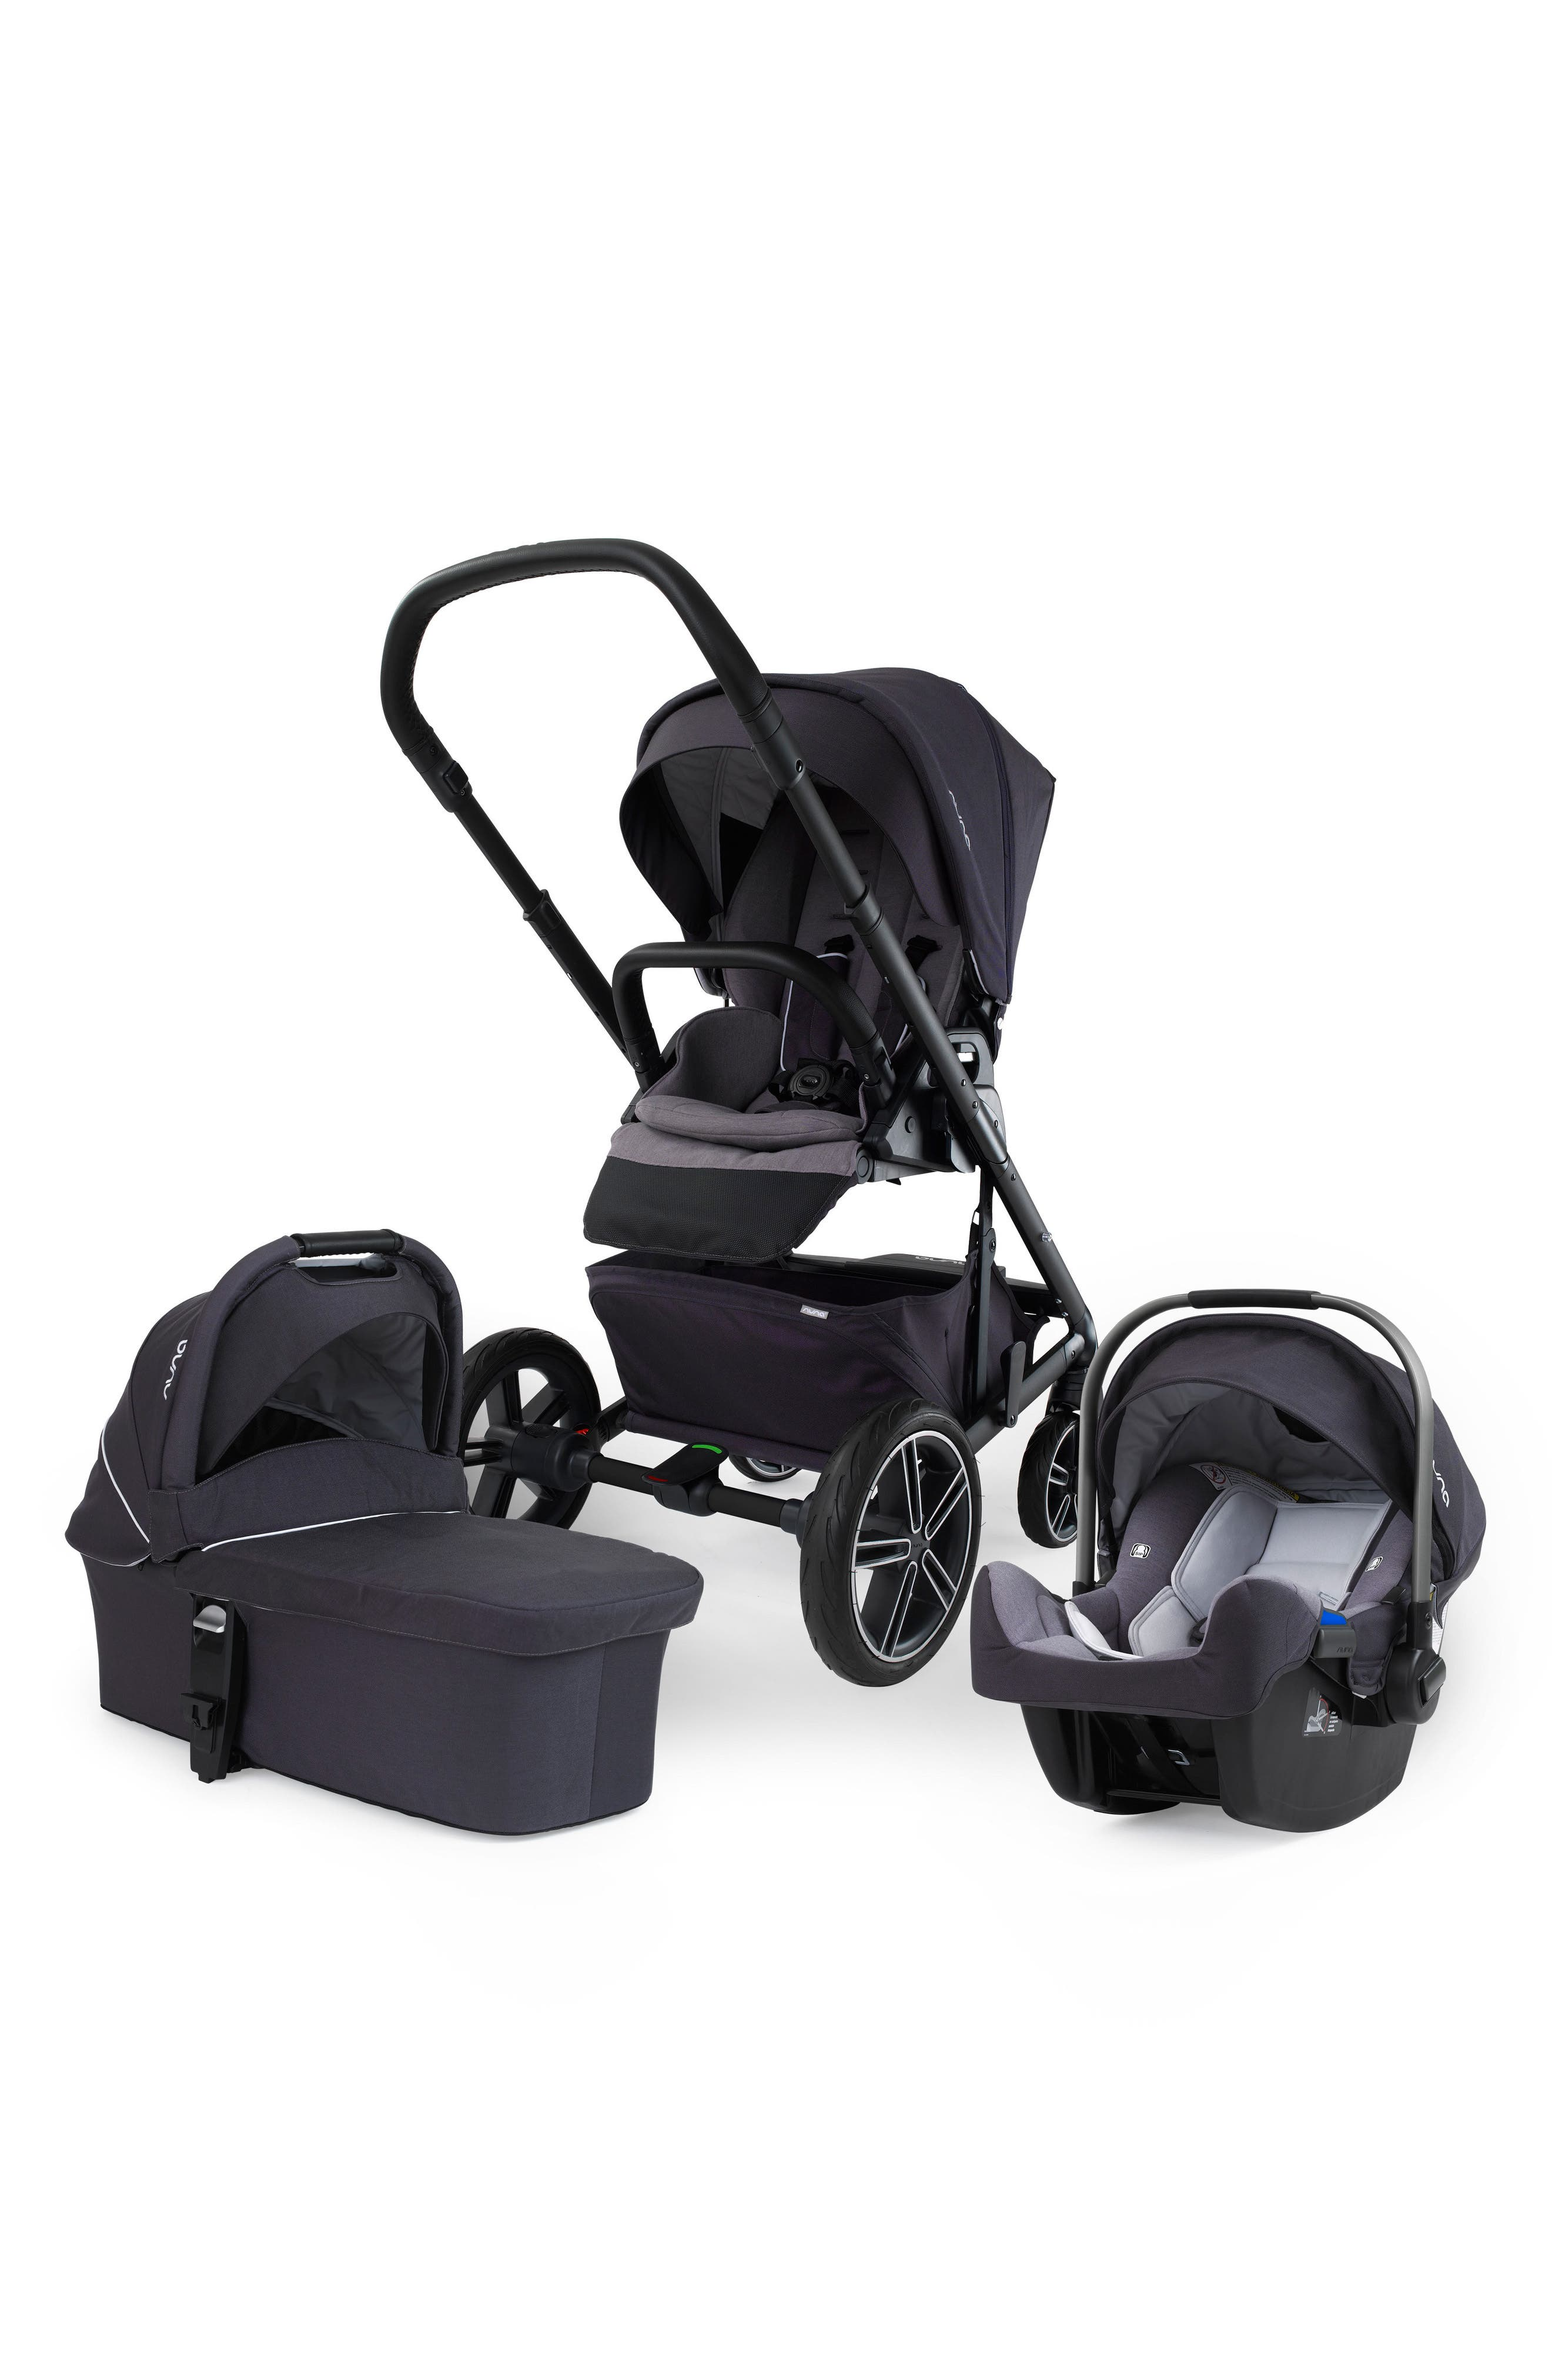 Alternate Image 1 Selected - nuna MIXX™ Stroller System & PIPA™ Car Seat Set